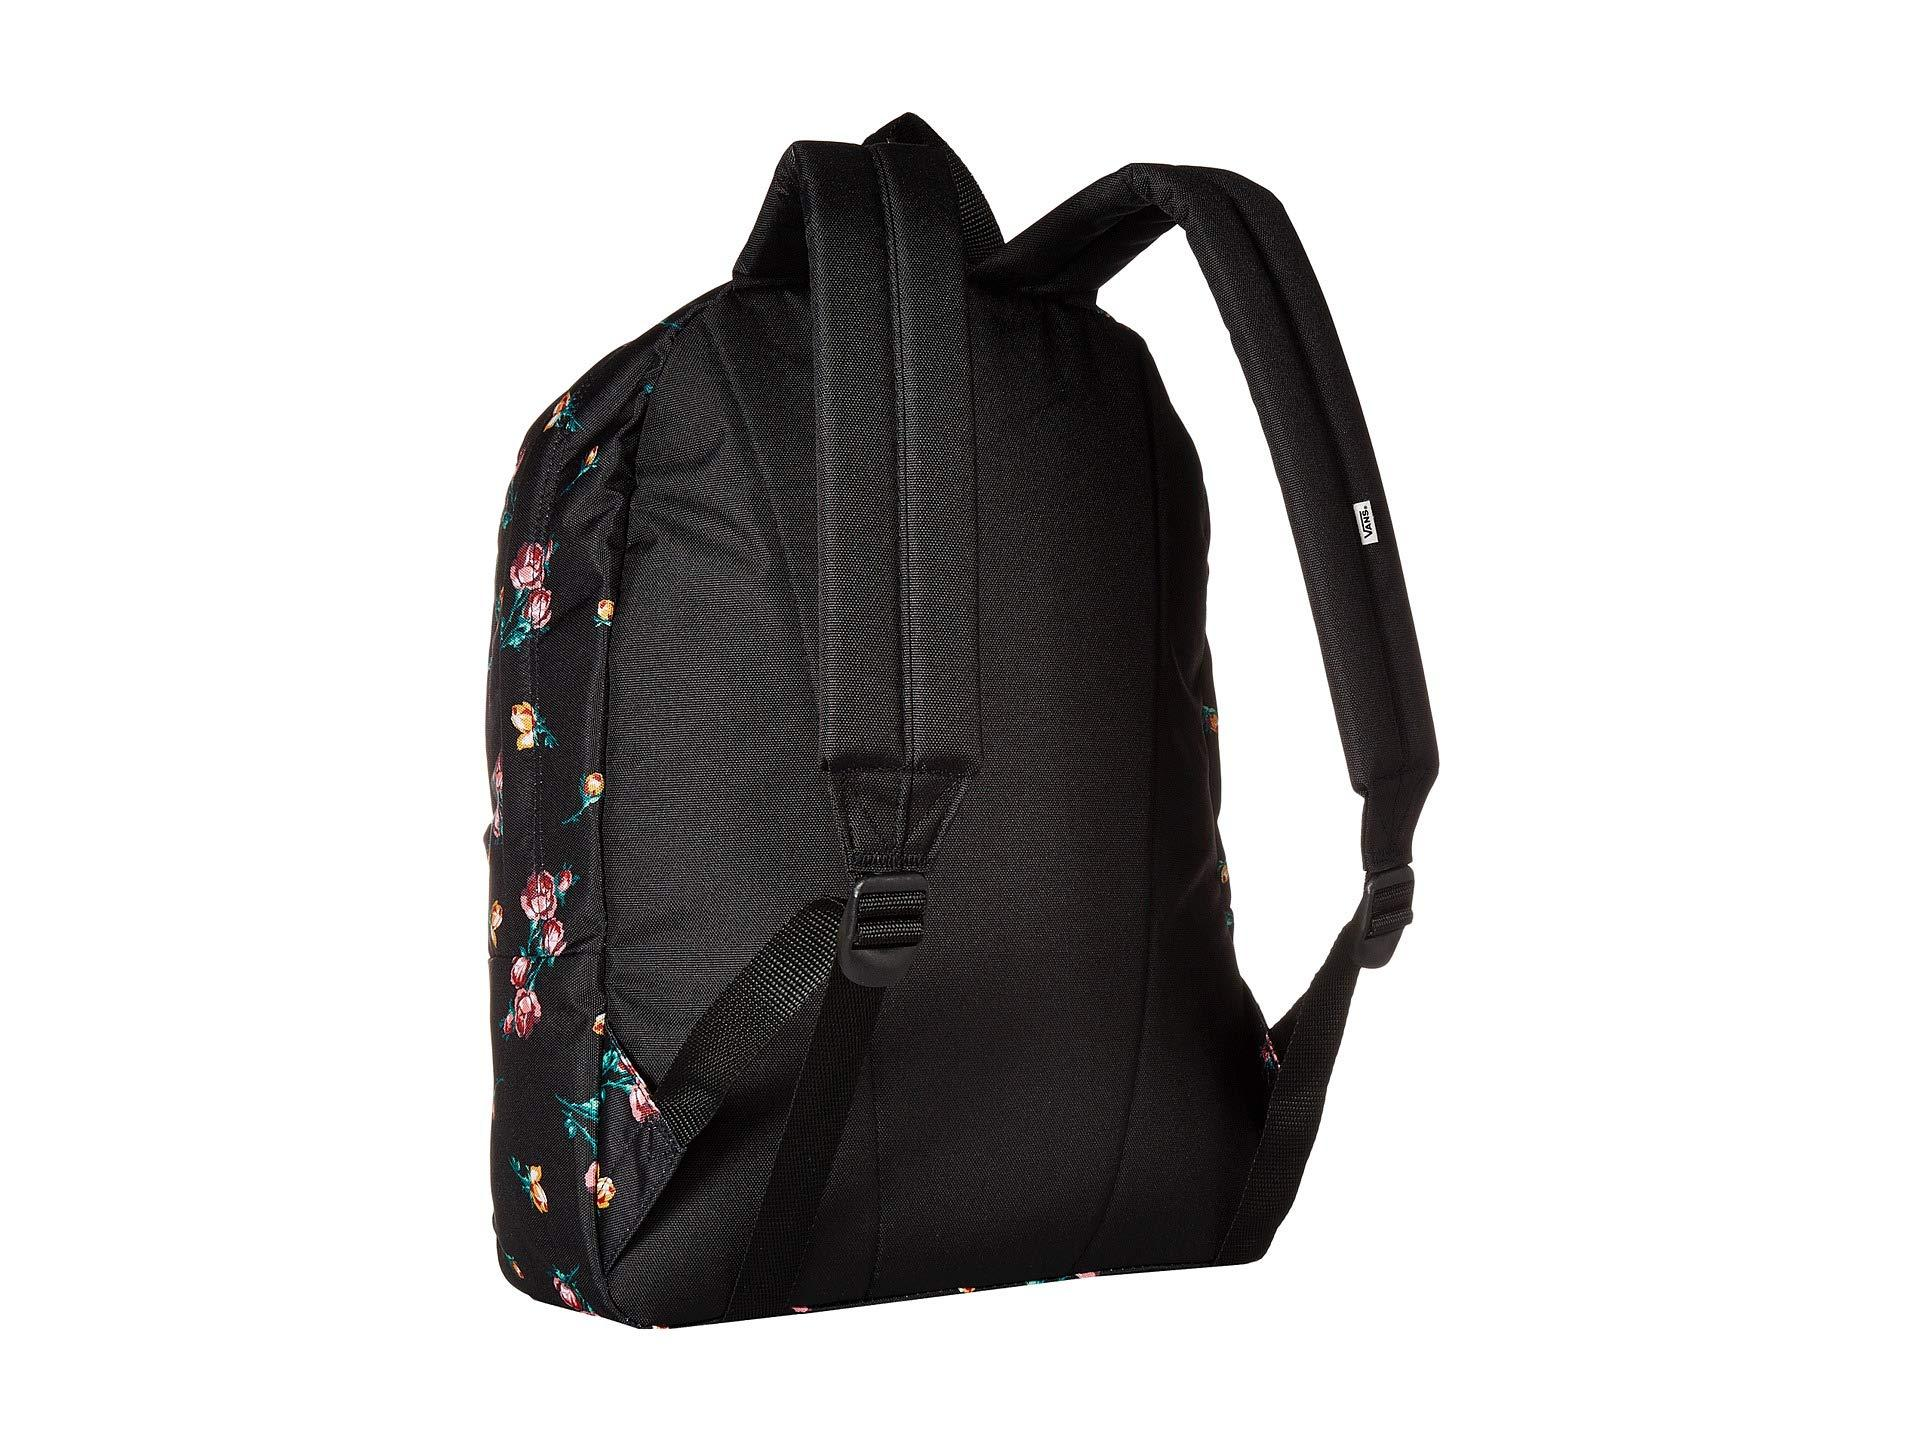 Vans - Black Realm Backpack (satin Floral) Backpack Bags - Lyst. View  fullscreen 14205e8dfbd69